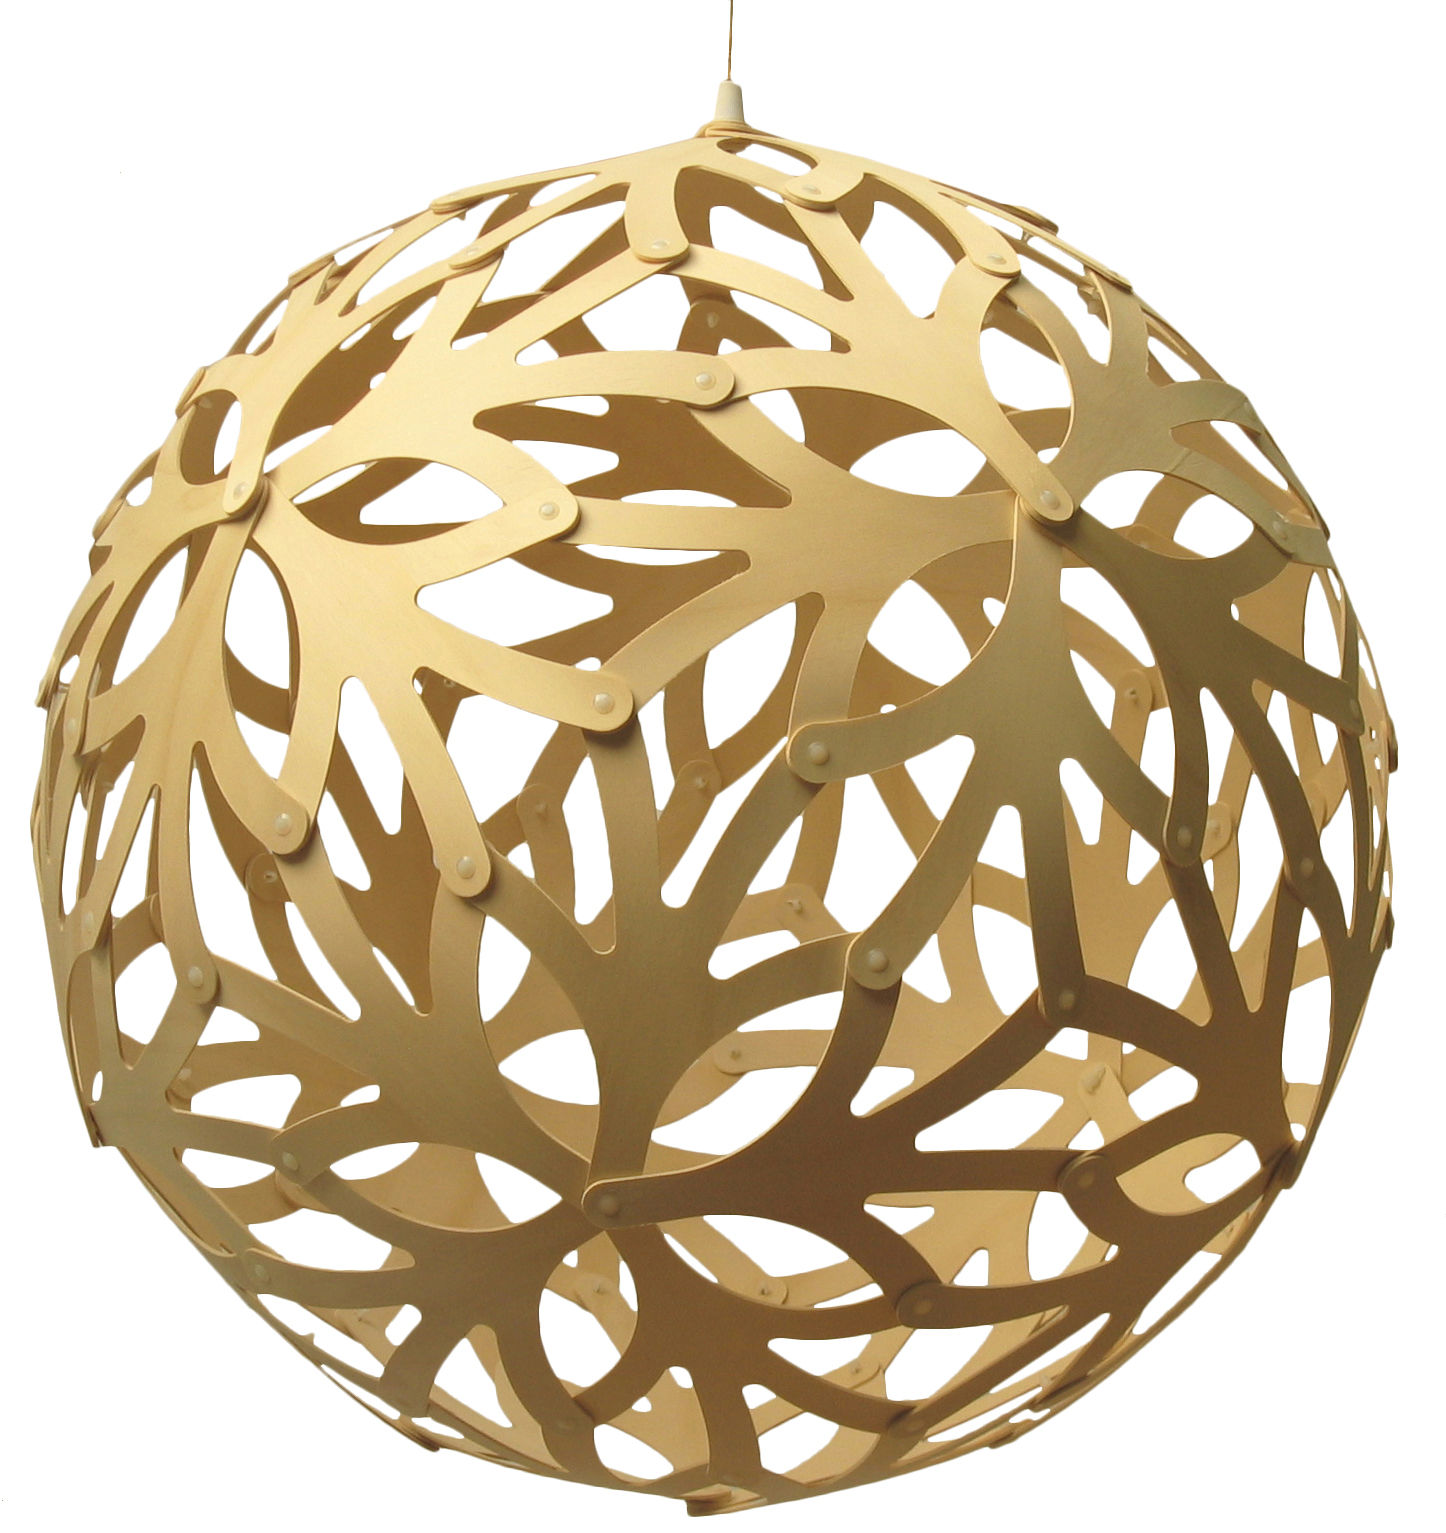 Leuchten - Pendelleuchten - Floral Pendelleuchte Ø 80 cm - David Trubridge - Holz natur - Ø 80 cm - Kiefernfurnier